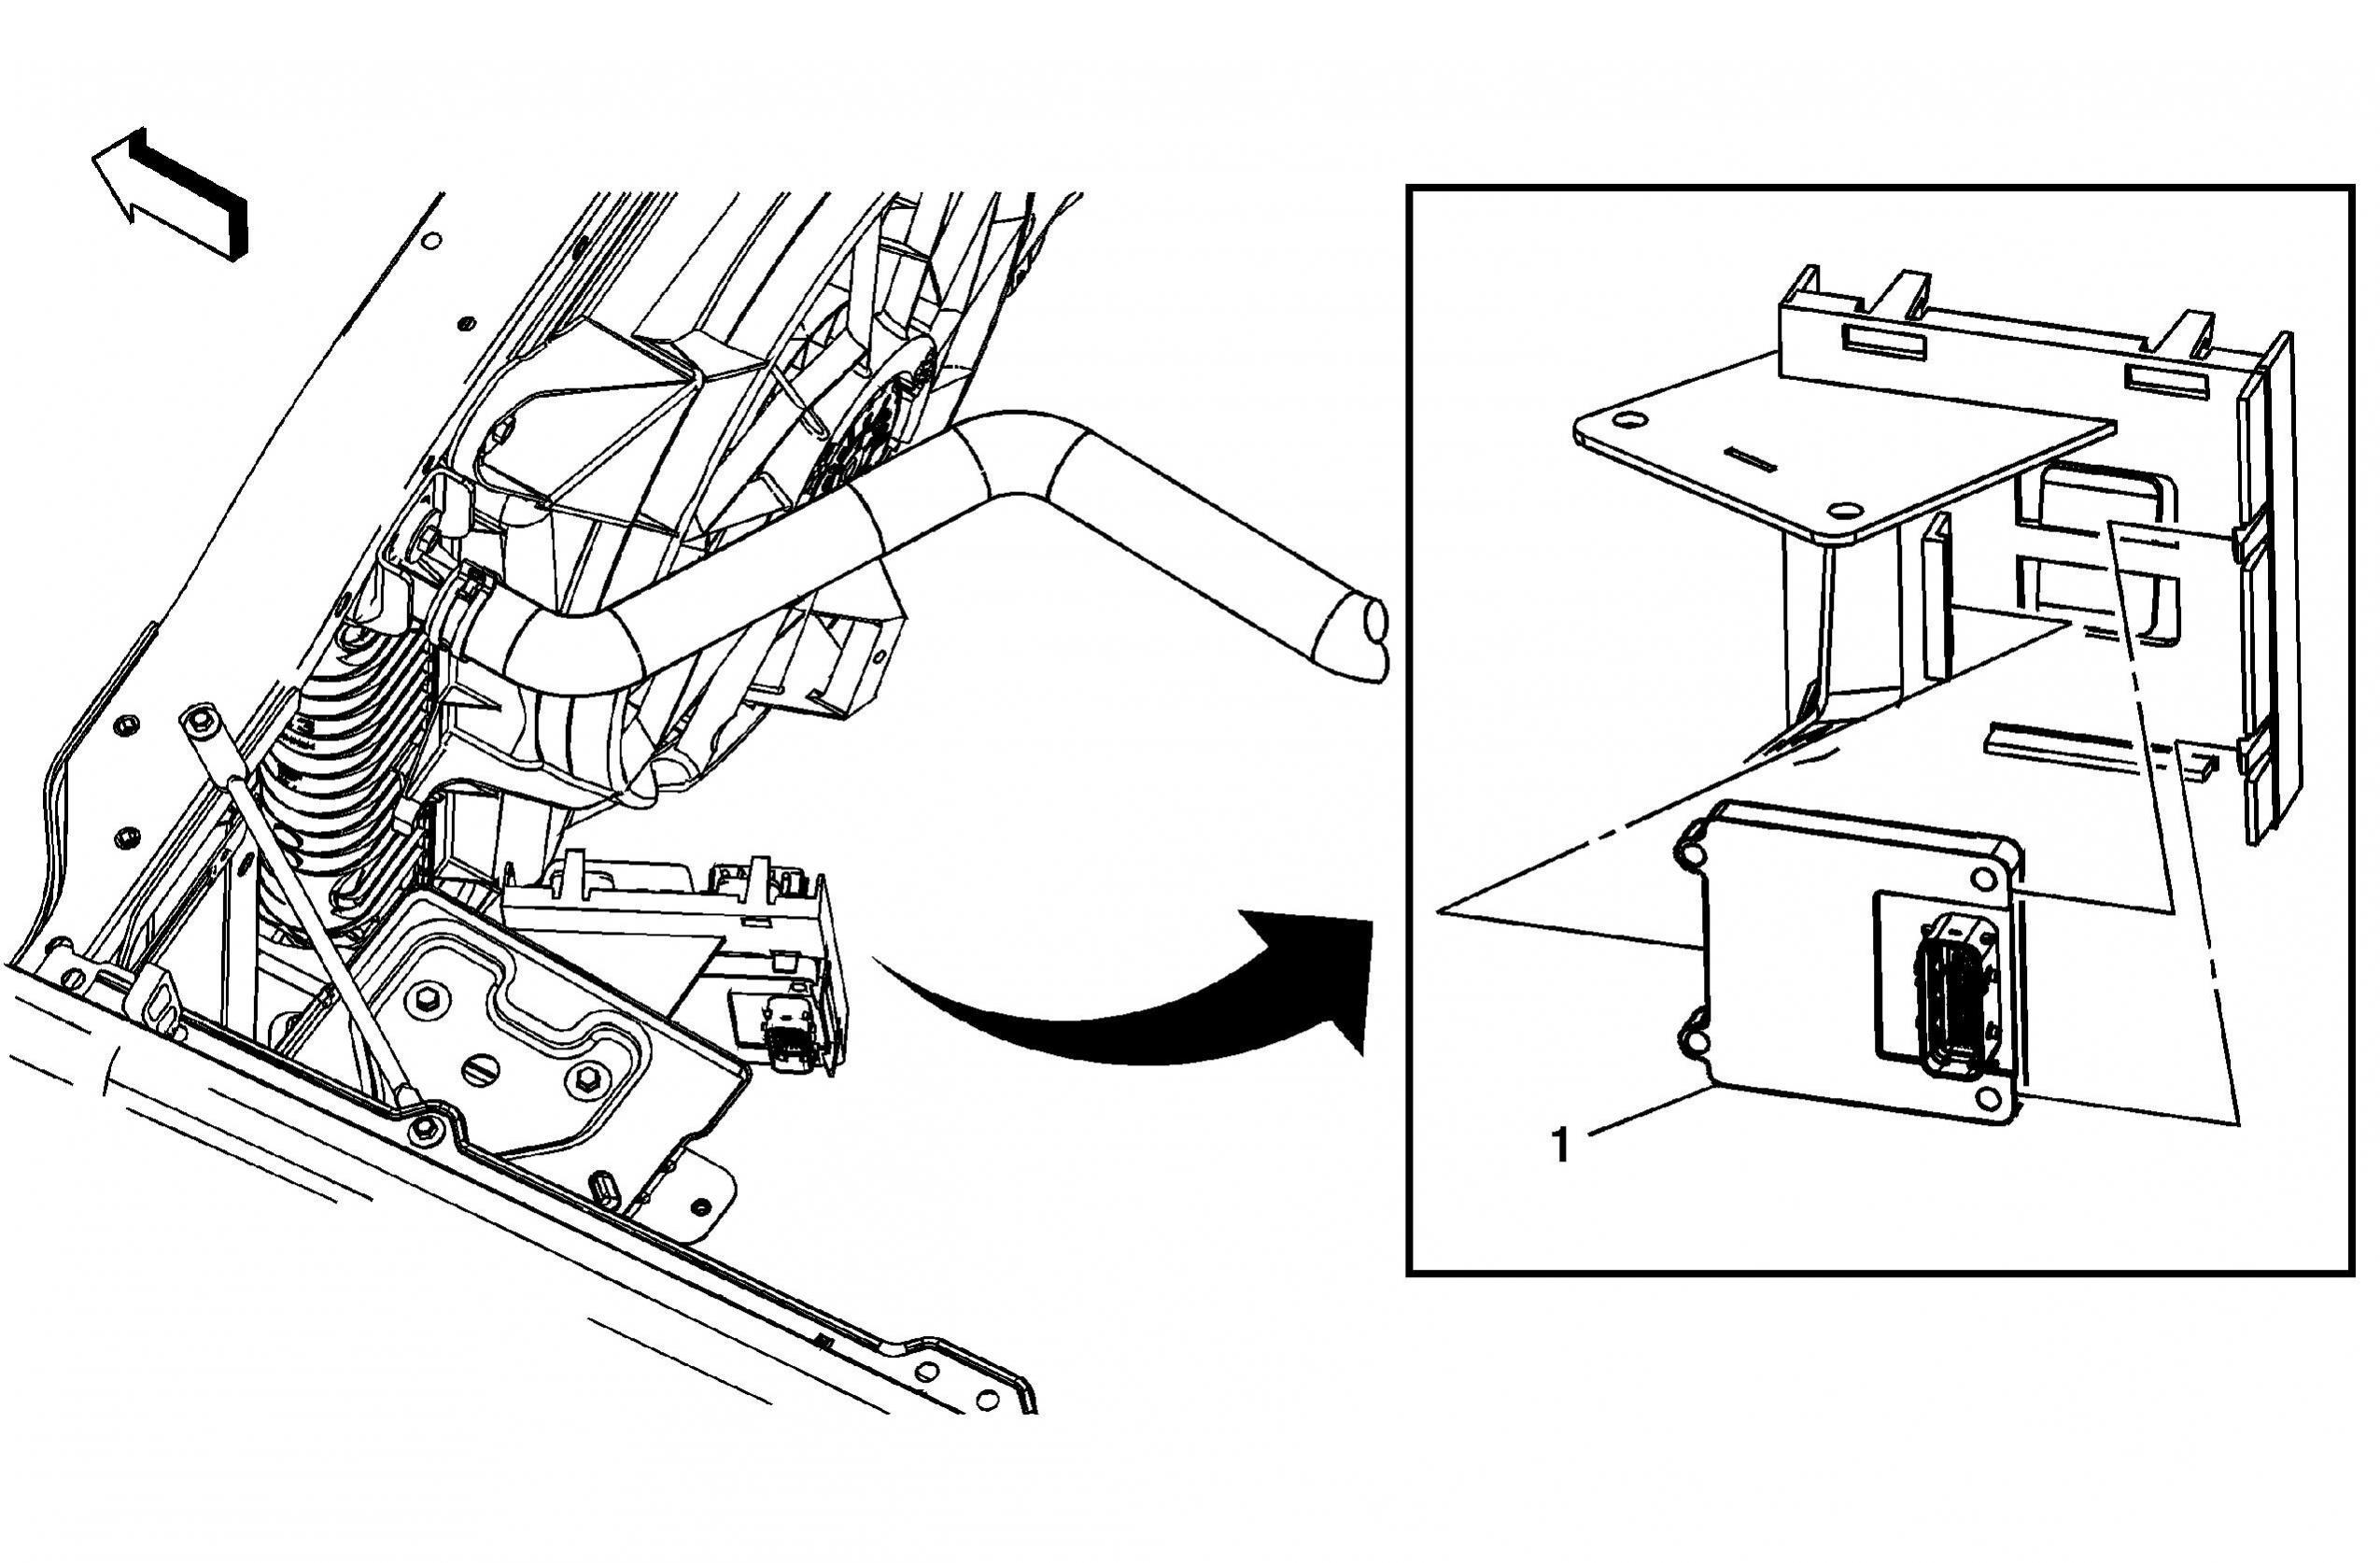 2006 chevy malibu fuse box diagram page 4